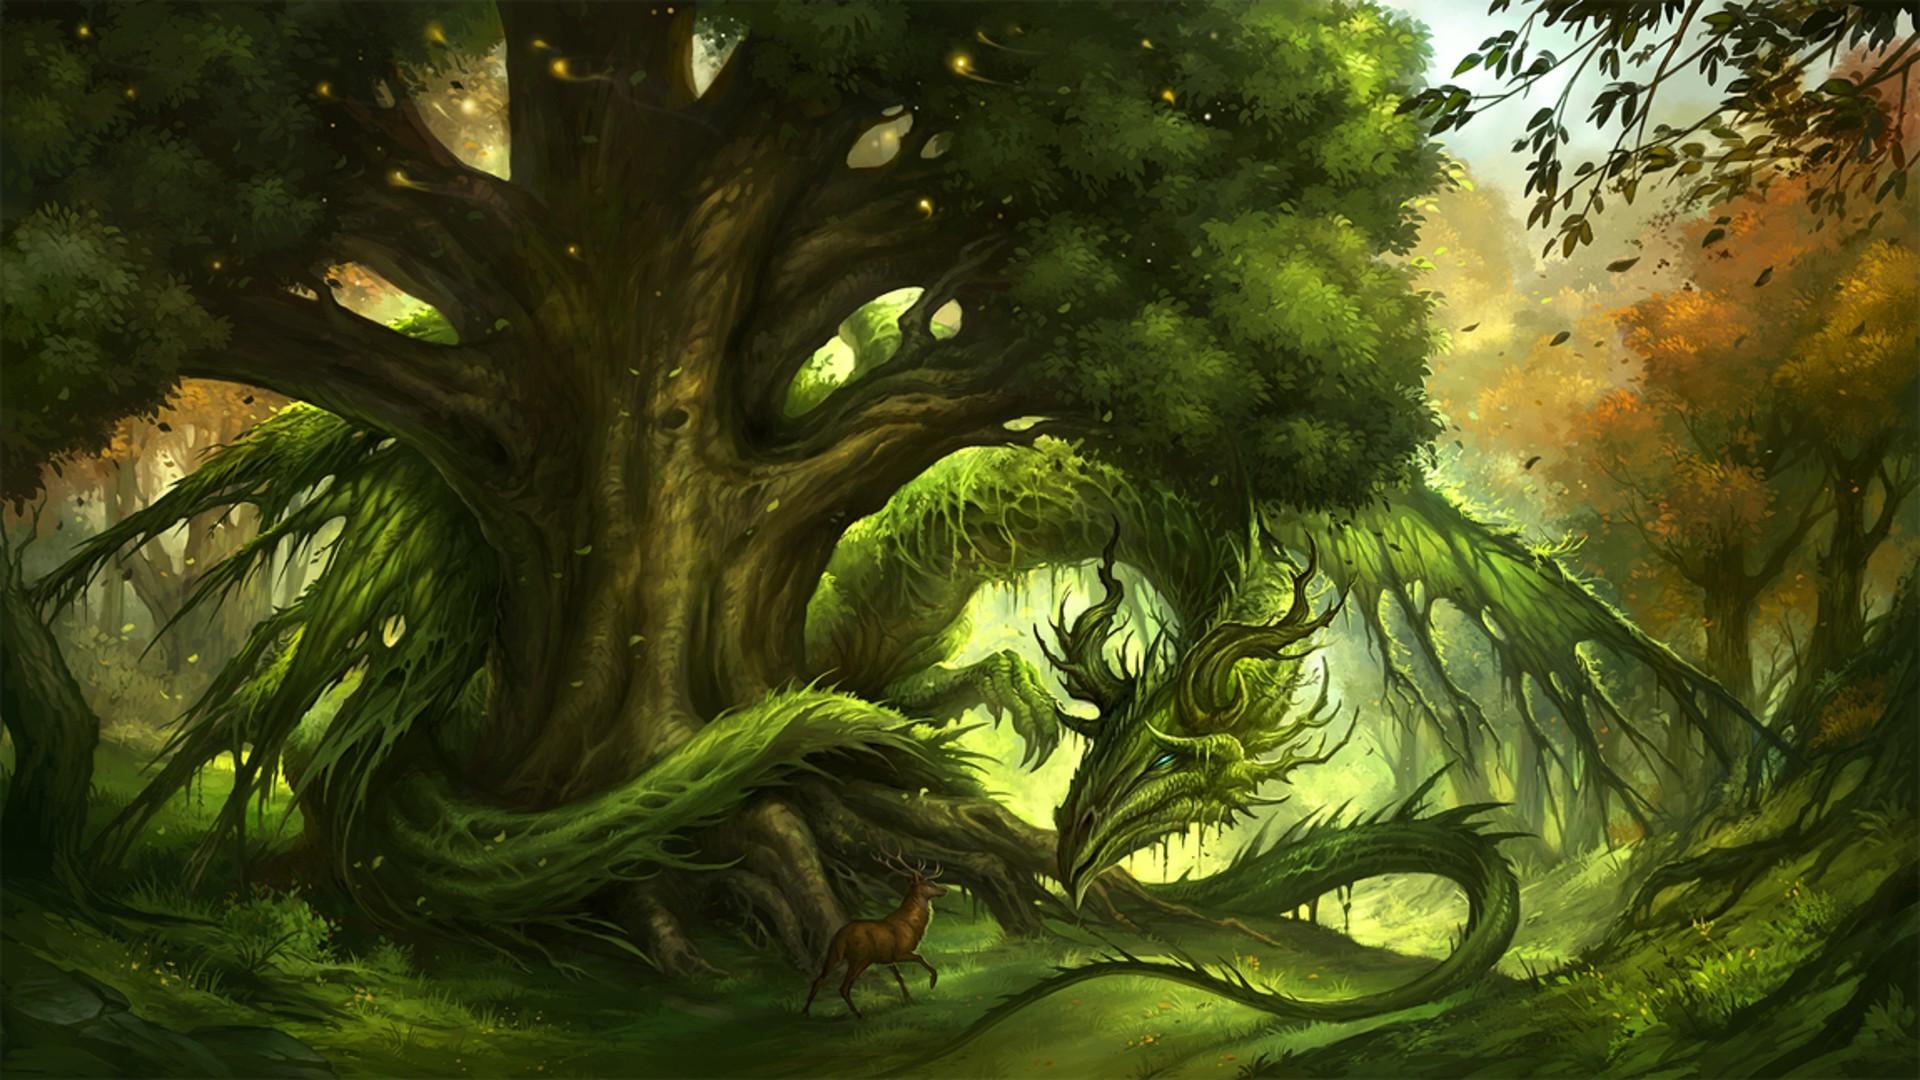 Great Wallpaper Dragon Green